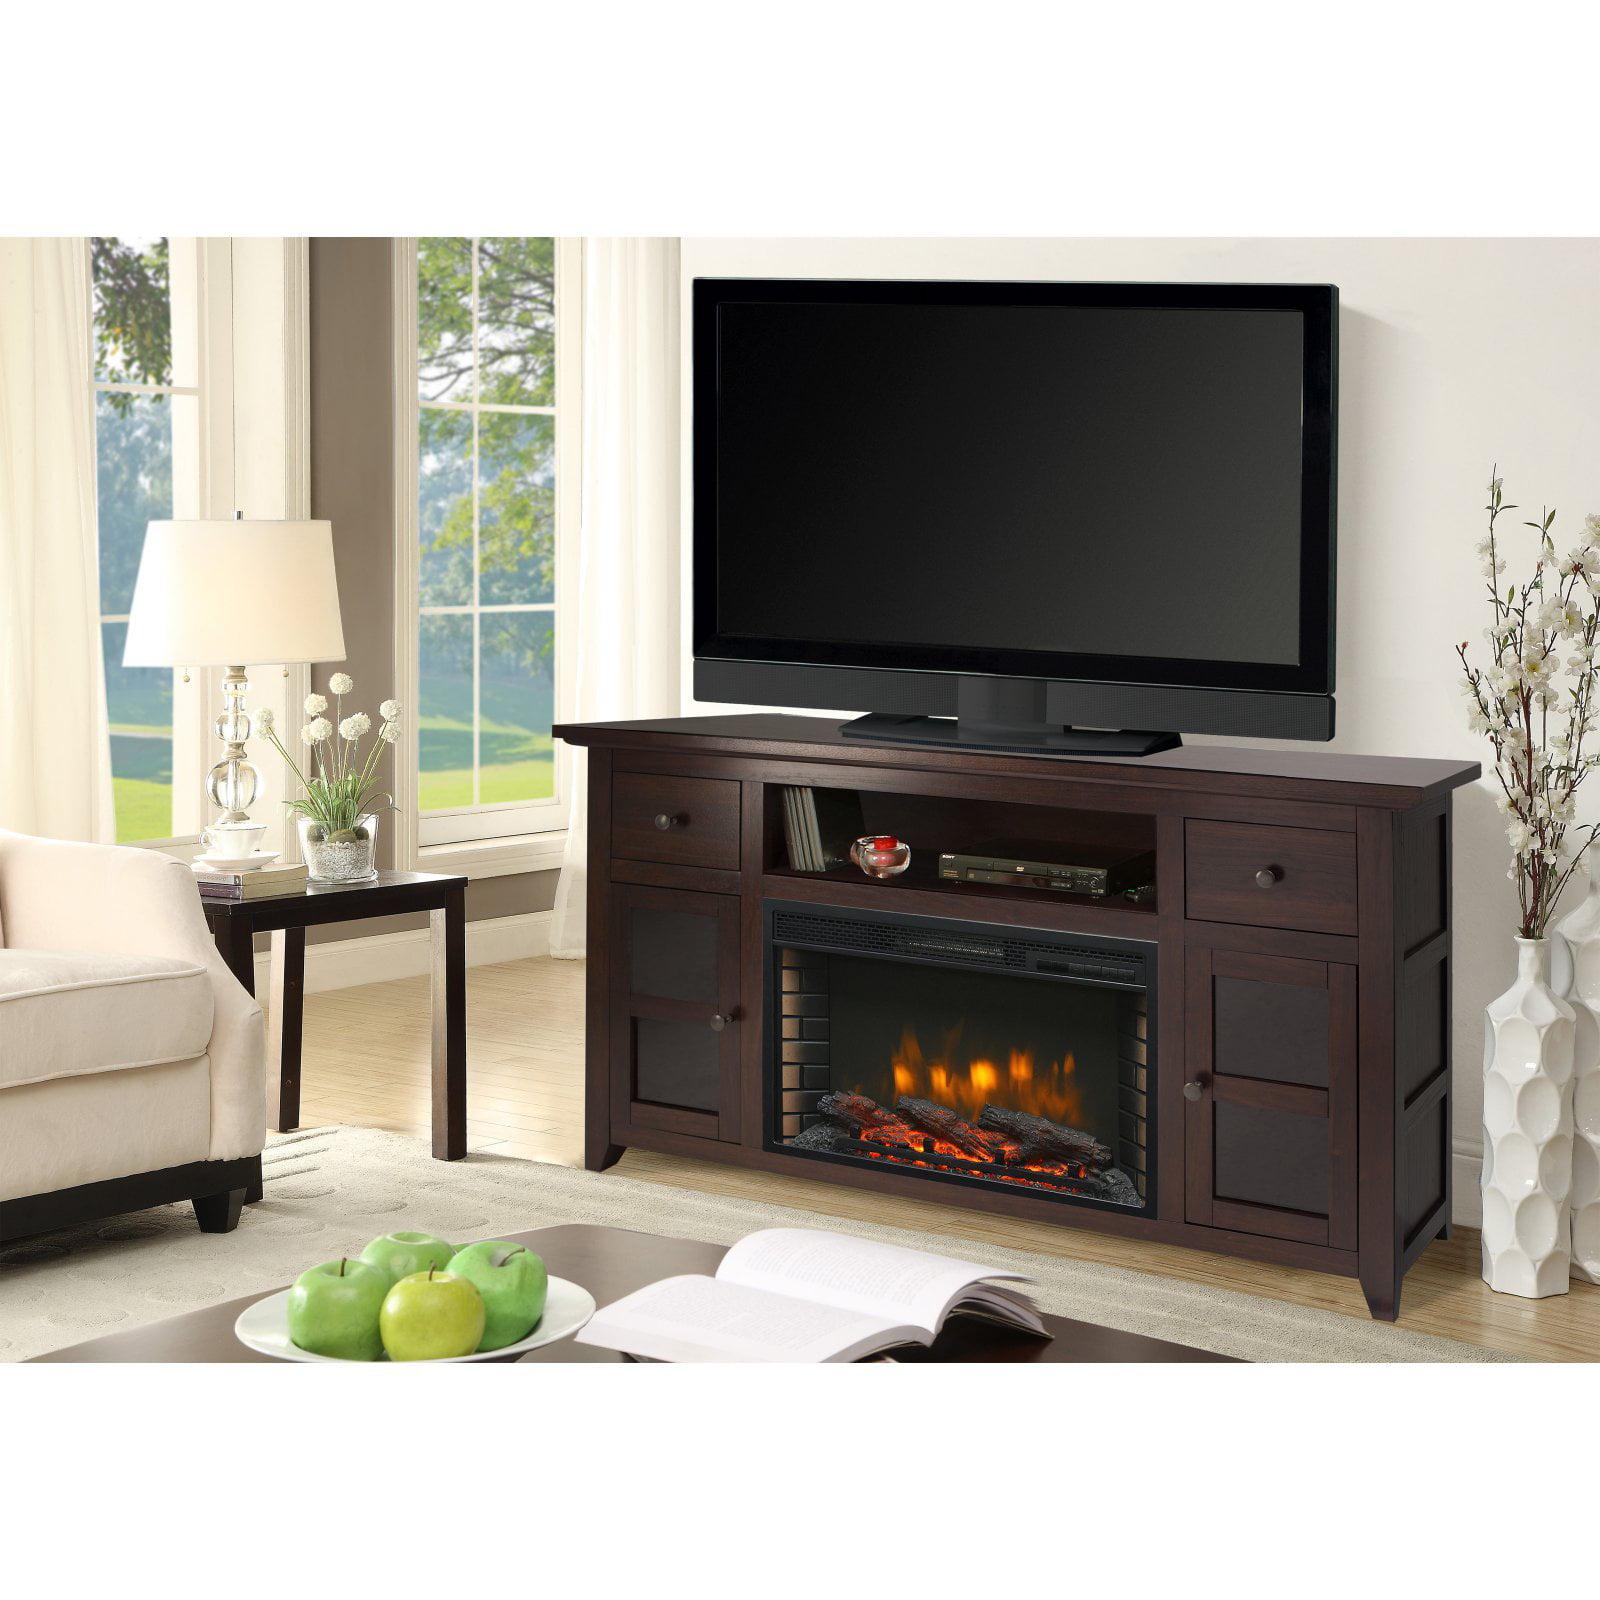 Winchester 56u0022 Media Electric Fireplace Dark Walnut Brown - Muskoka